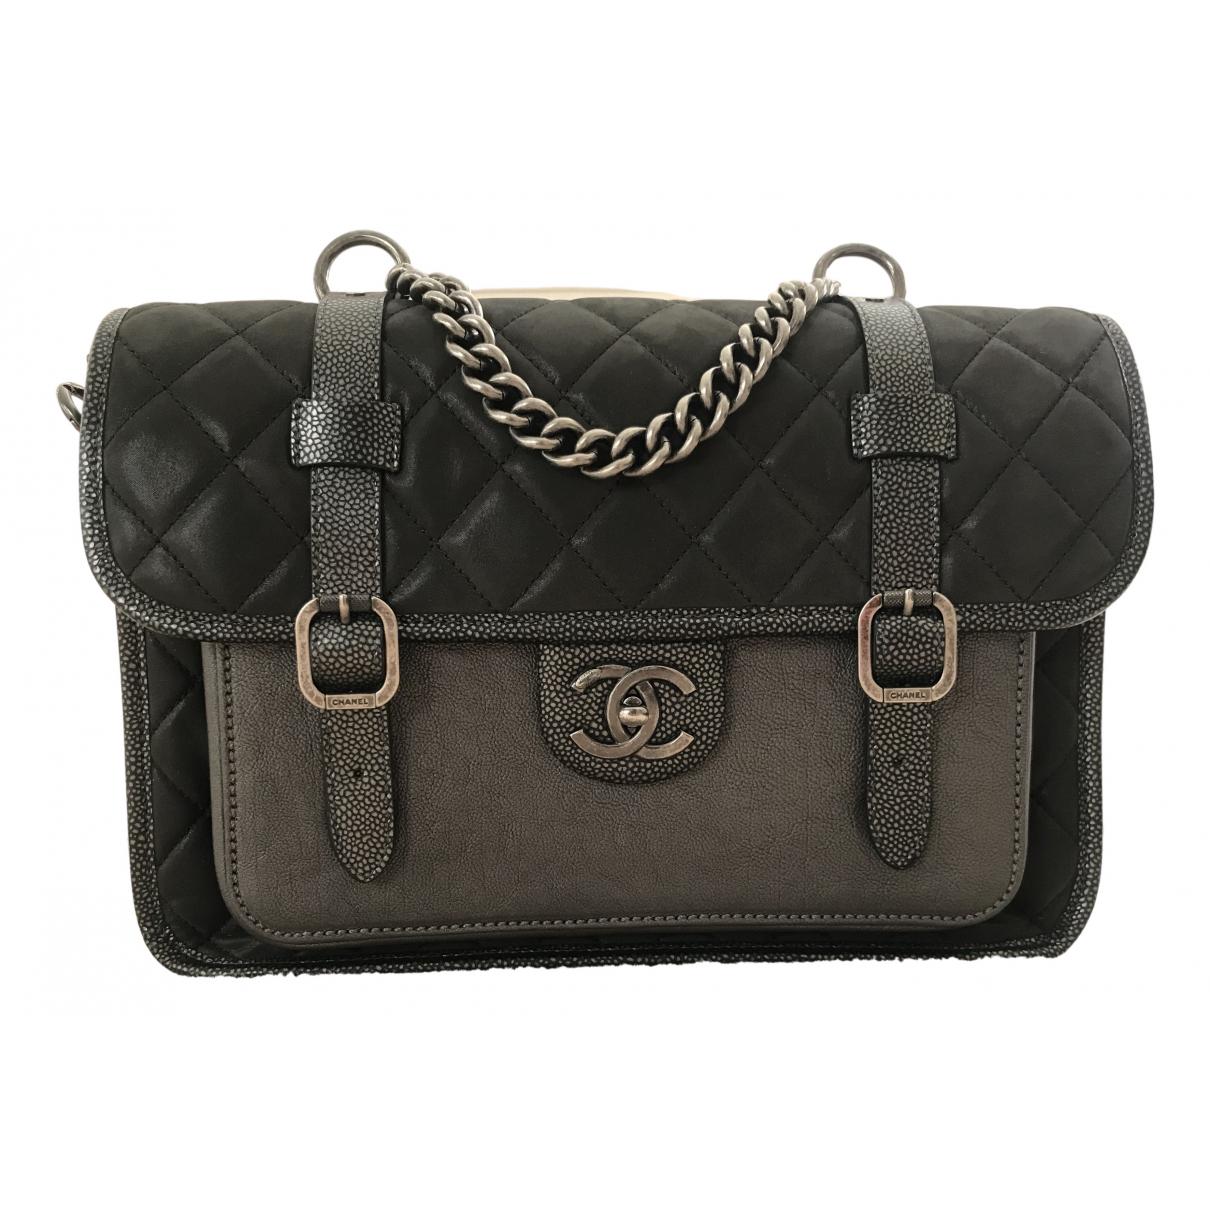 Chanel N Khaki Leather handbag for Women N